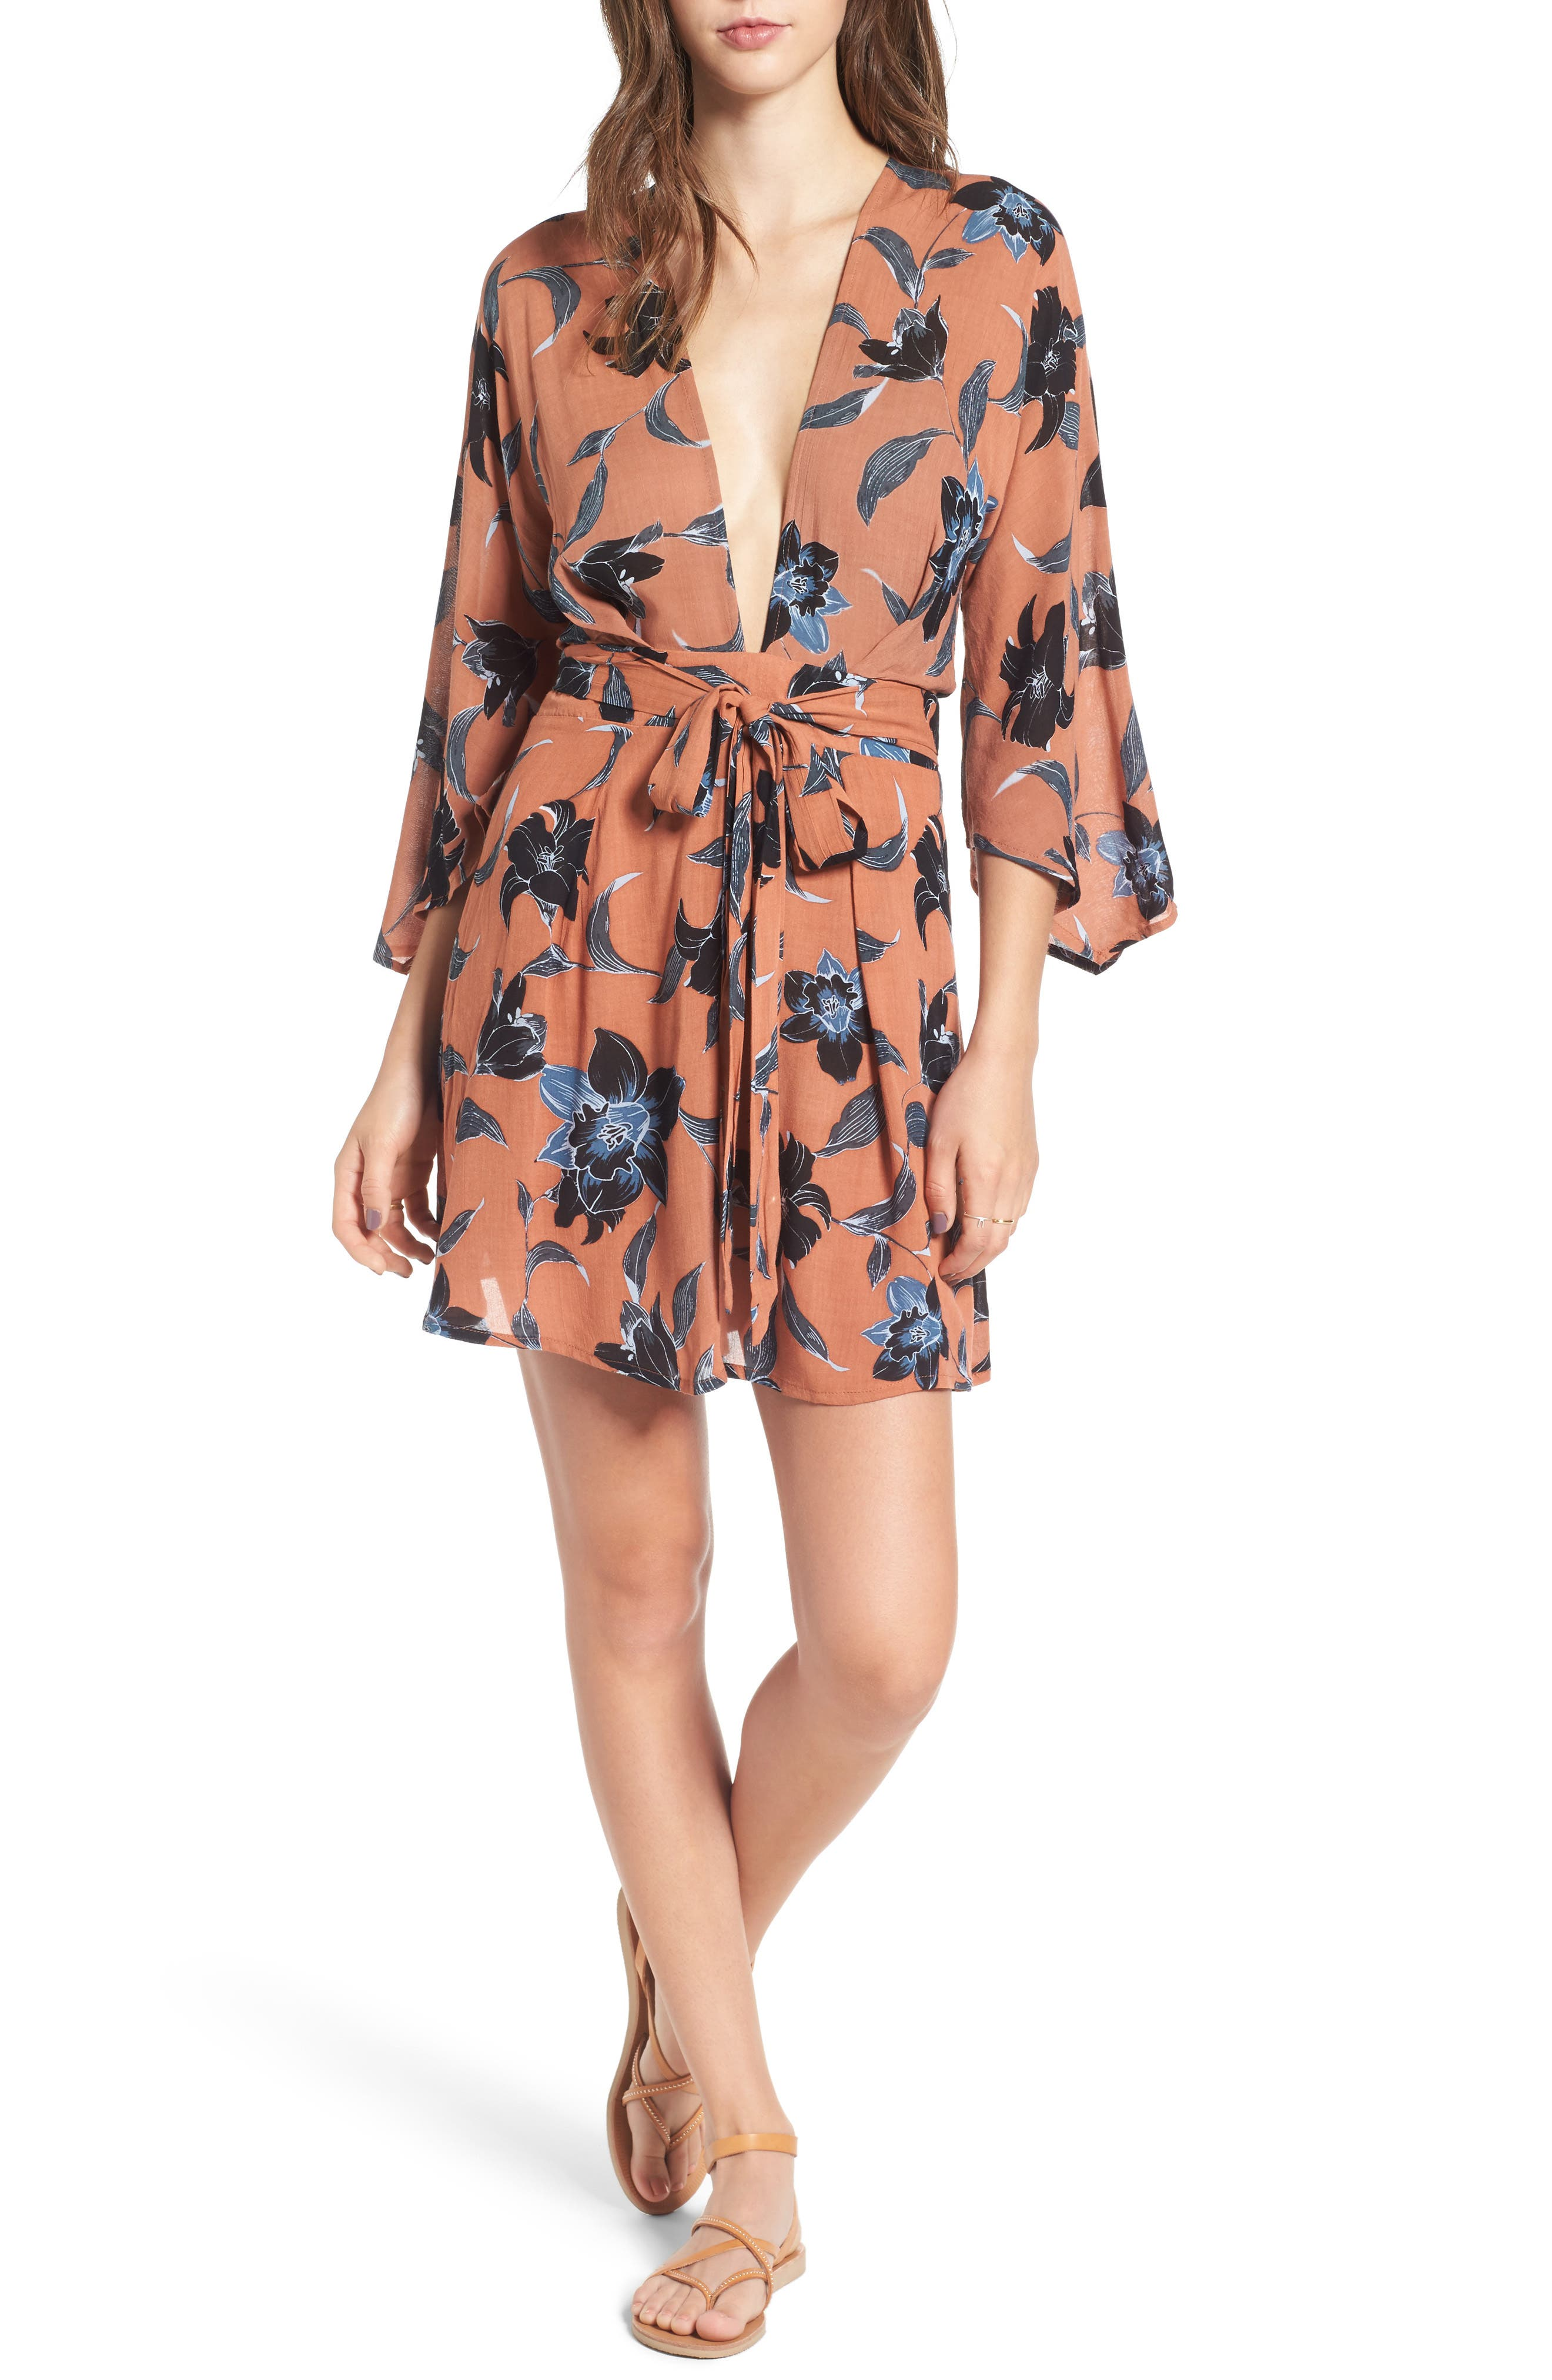 FAITHFULL THE BRAND Nova Floral Print Dress